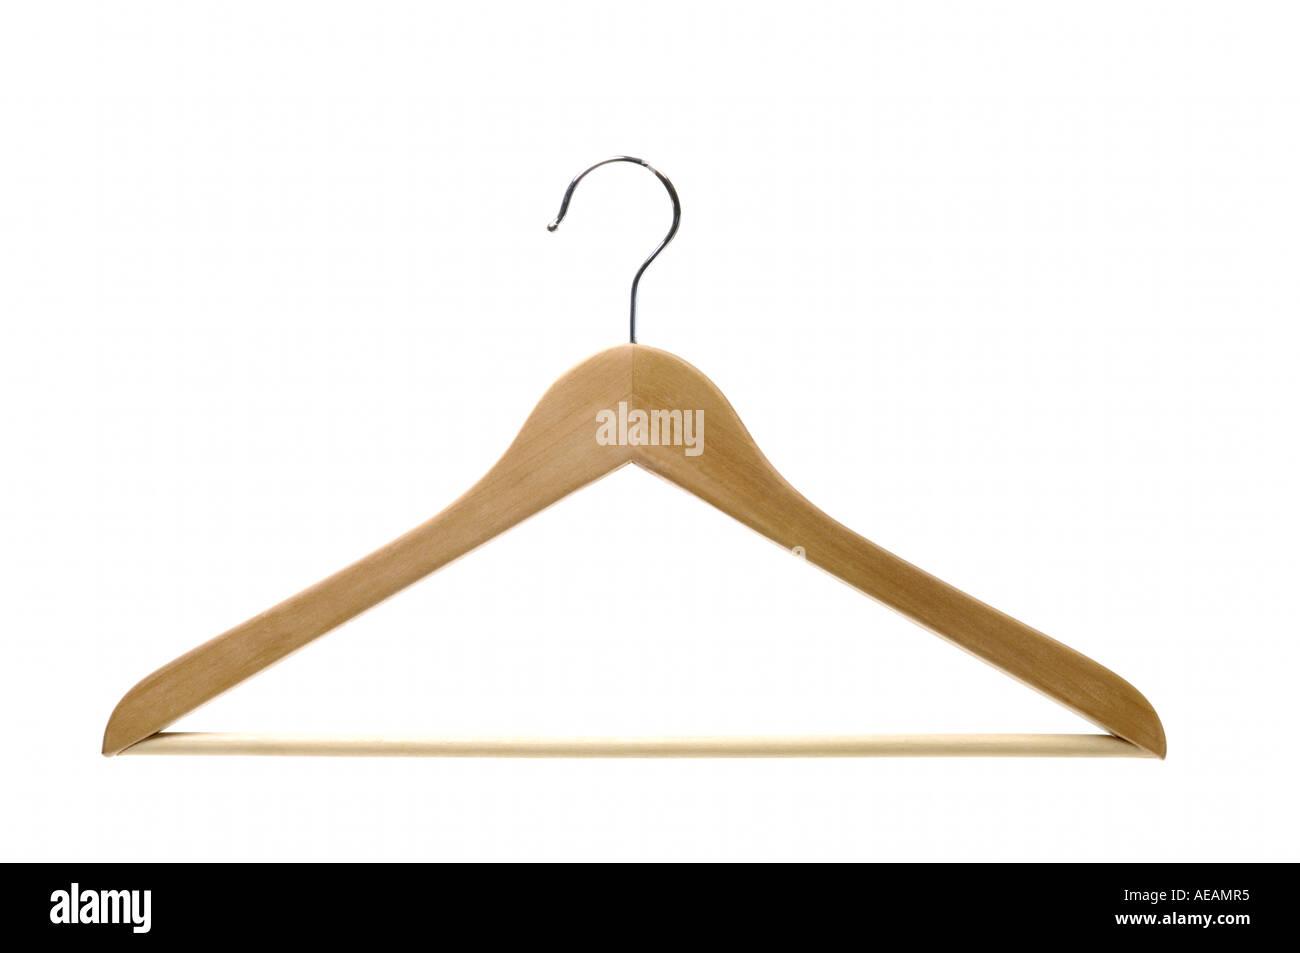 Wooden Hanger - Stock Image